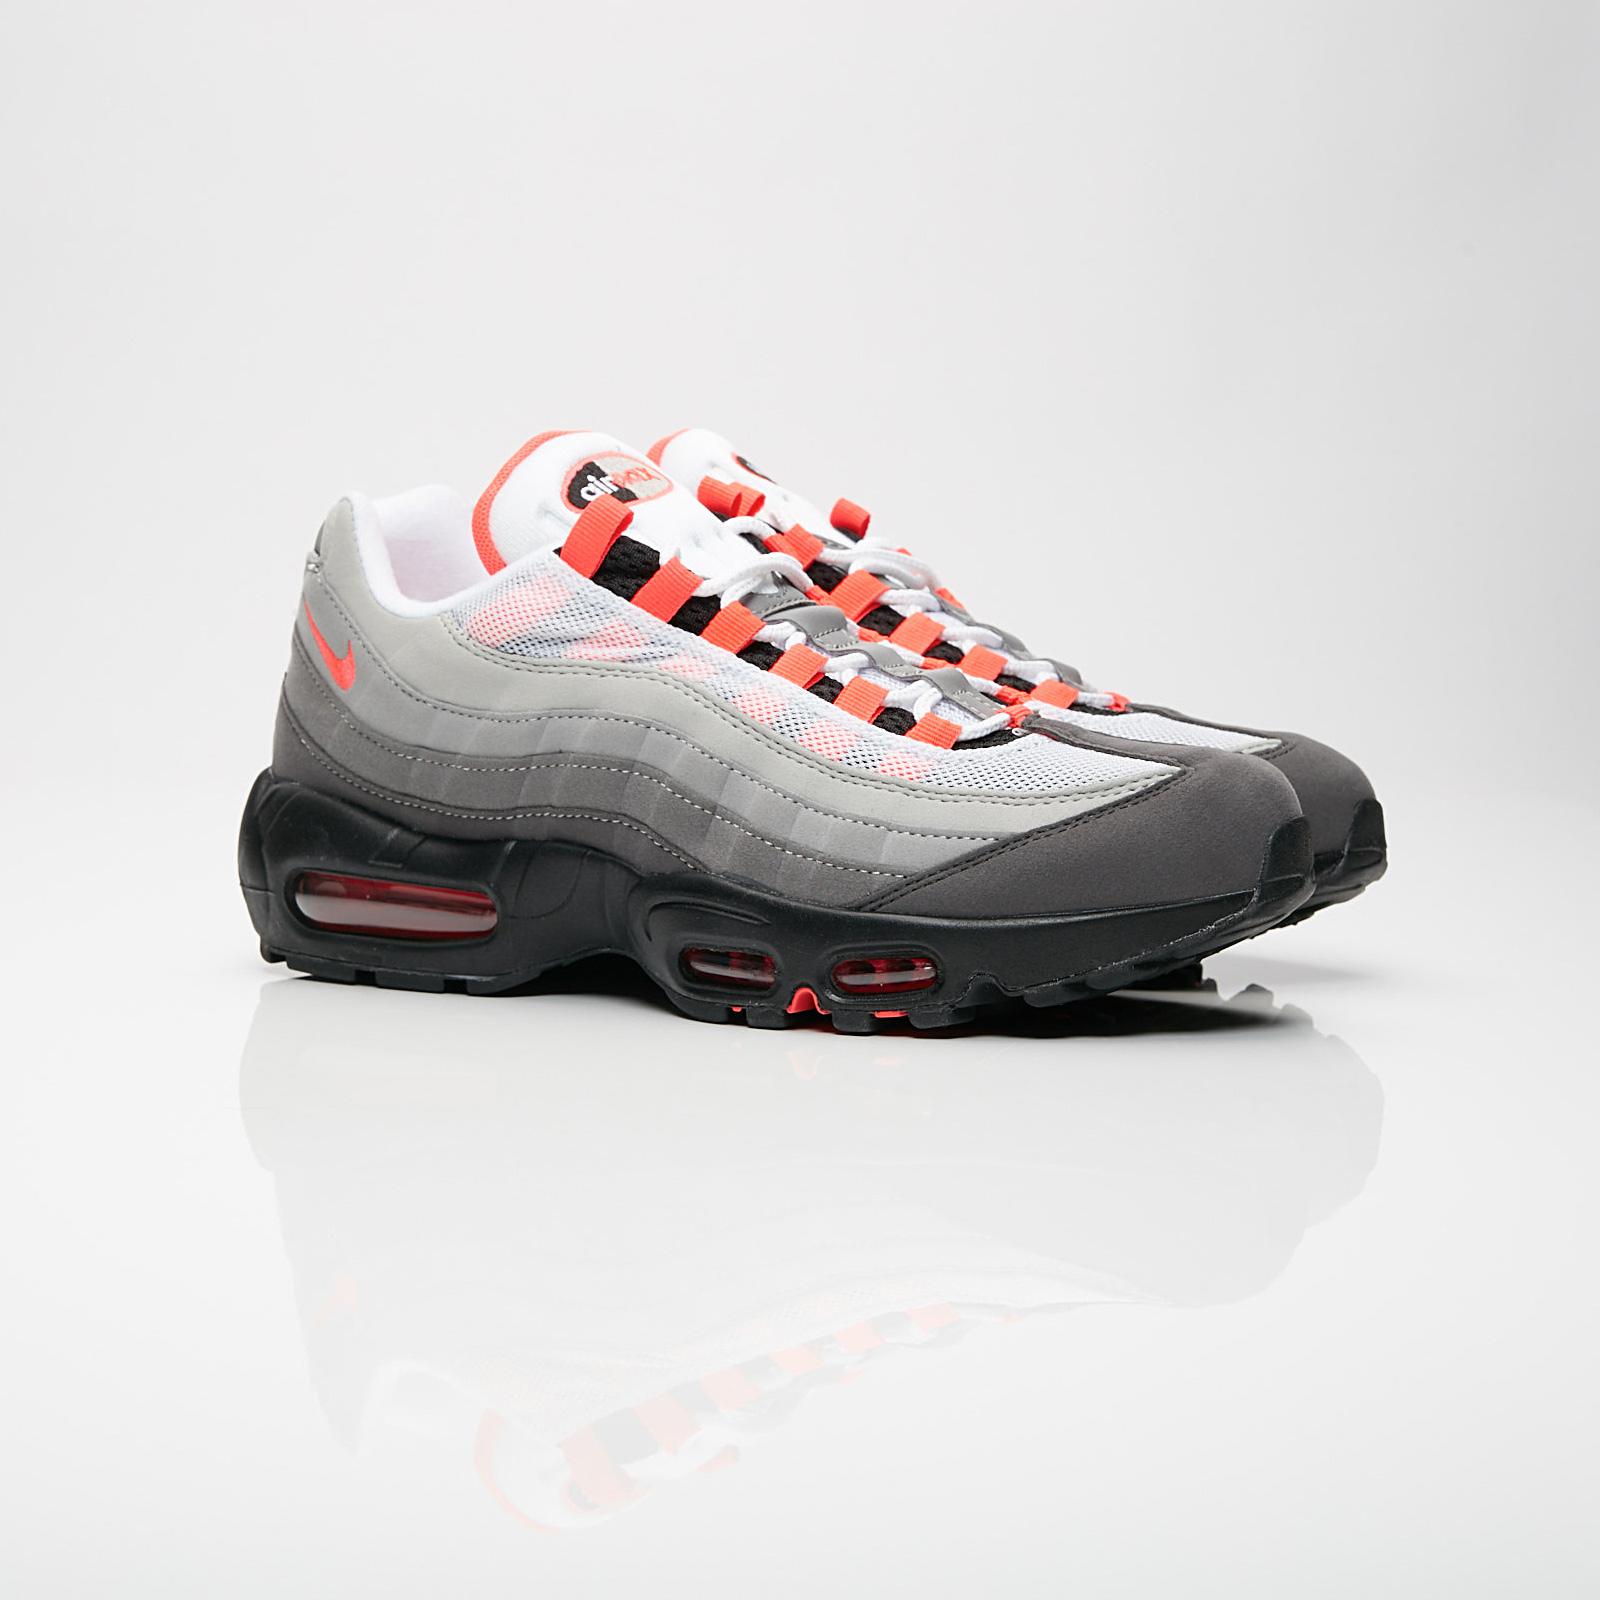 88d2ecee Very Goods   Nike Air Max 95 OG - At2865-100 - Sneakersnstuff ...